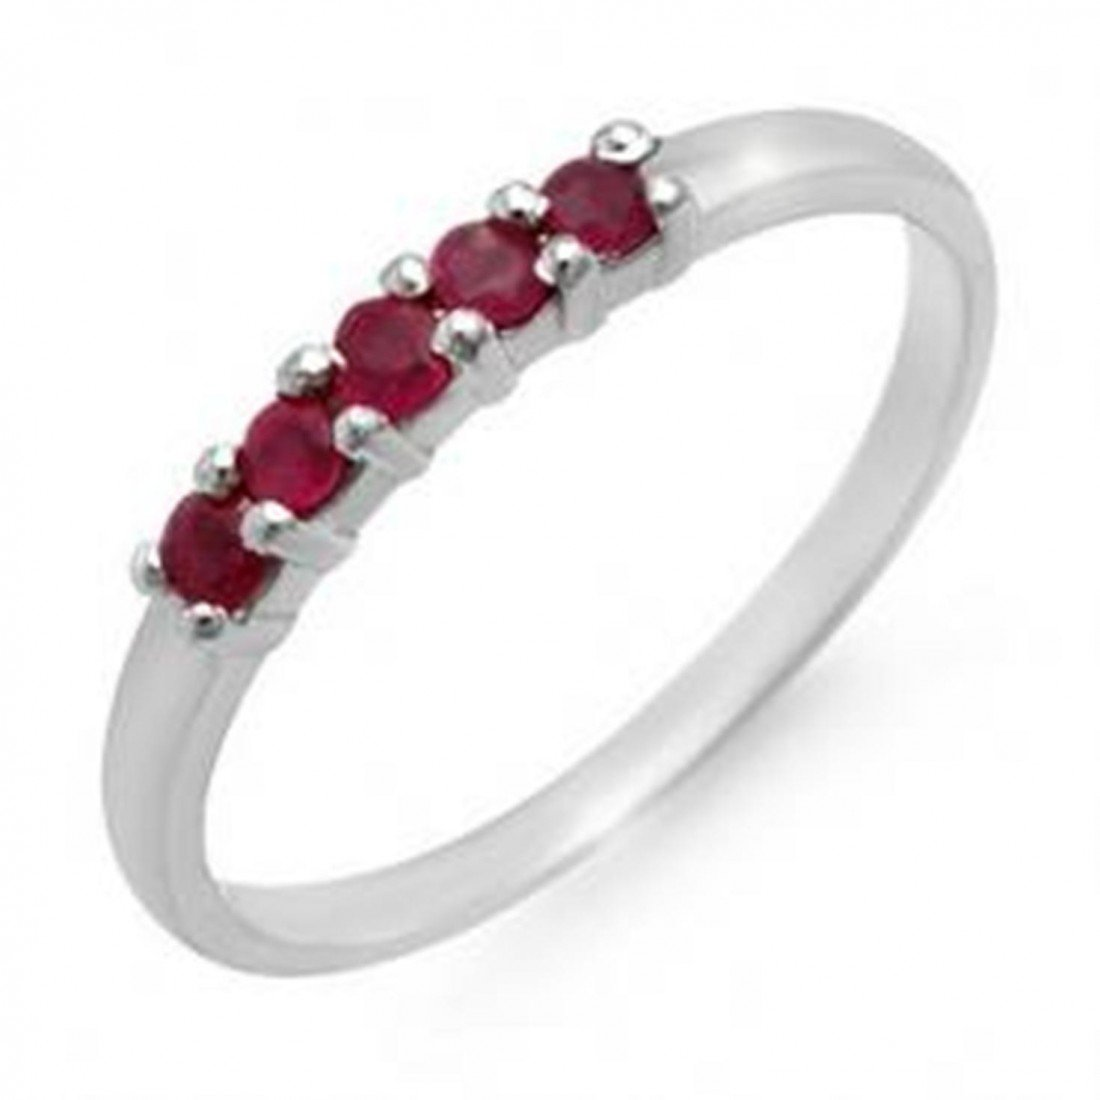 2A: 0.25 ctw Ruby Ladies Ring 10K